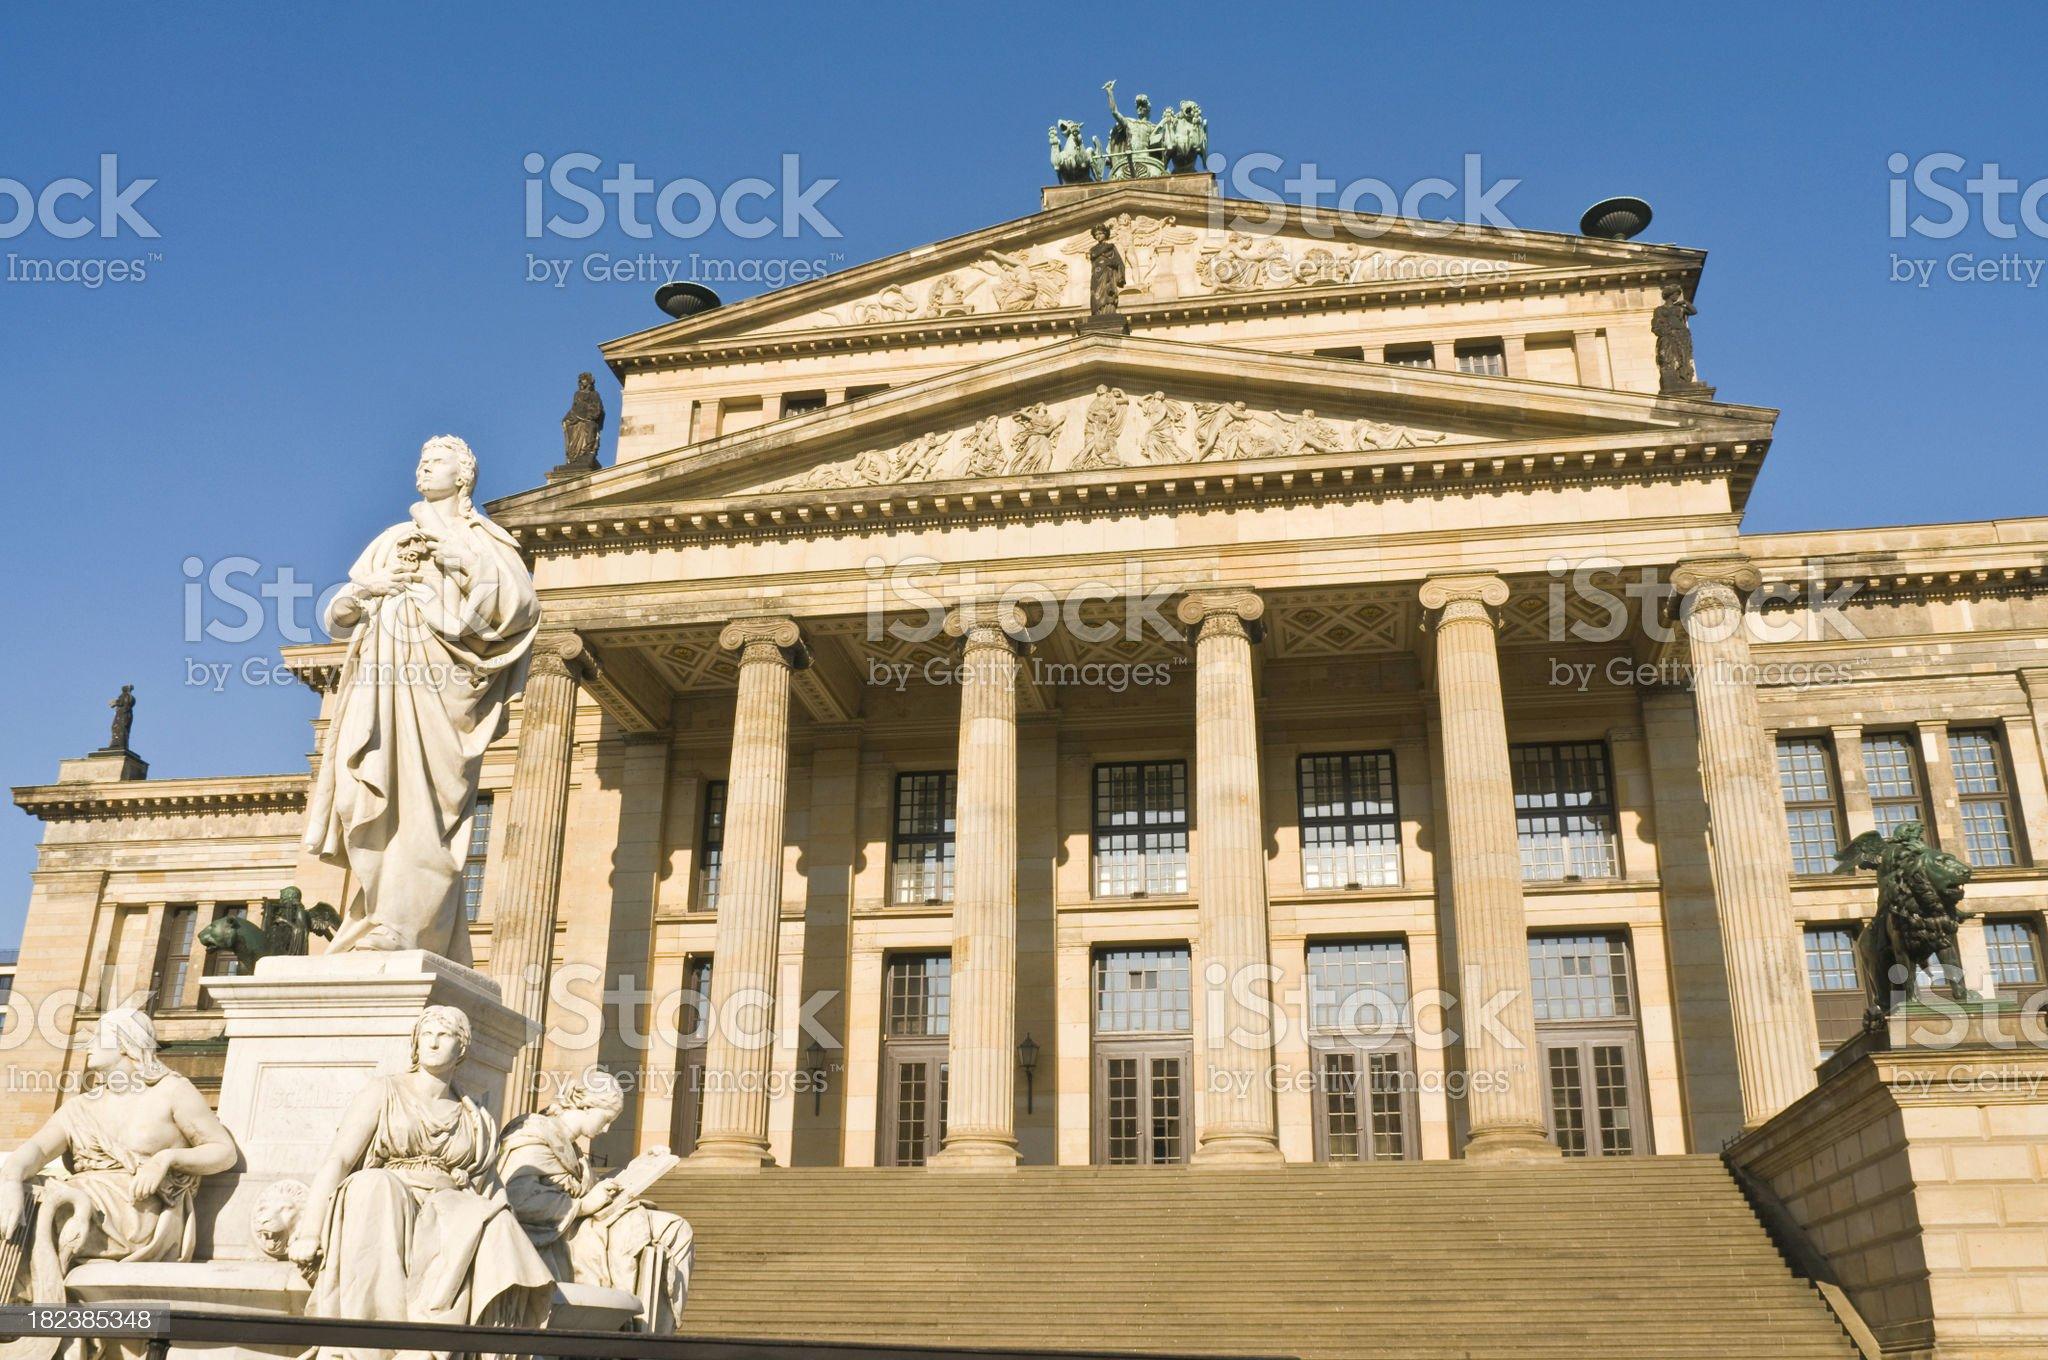 Berlin Gendarmenmarkt Konzerthaus historic collonade steps statues entrance Germany royalty-free stock photo